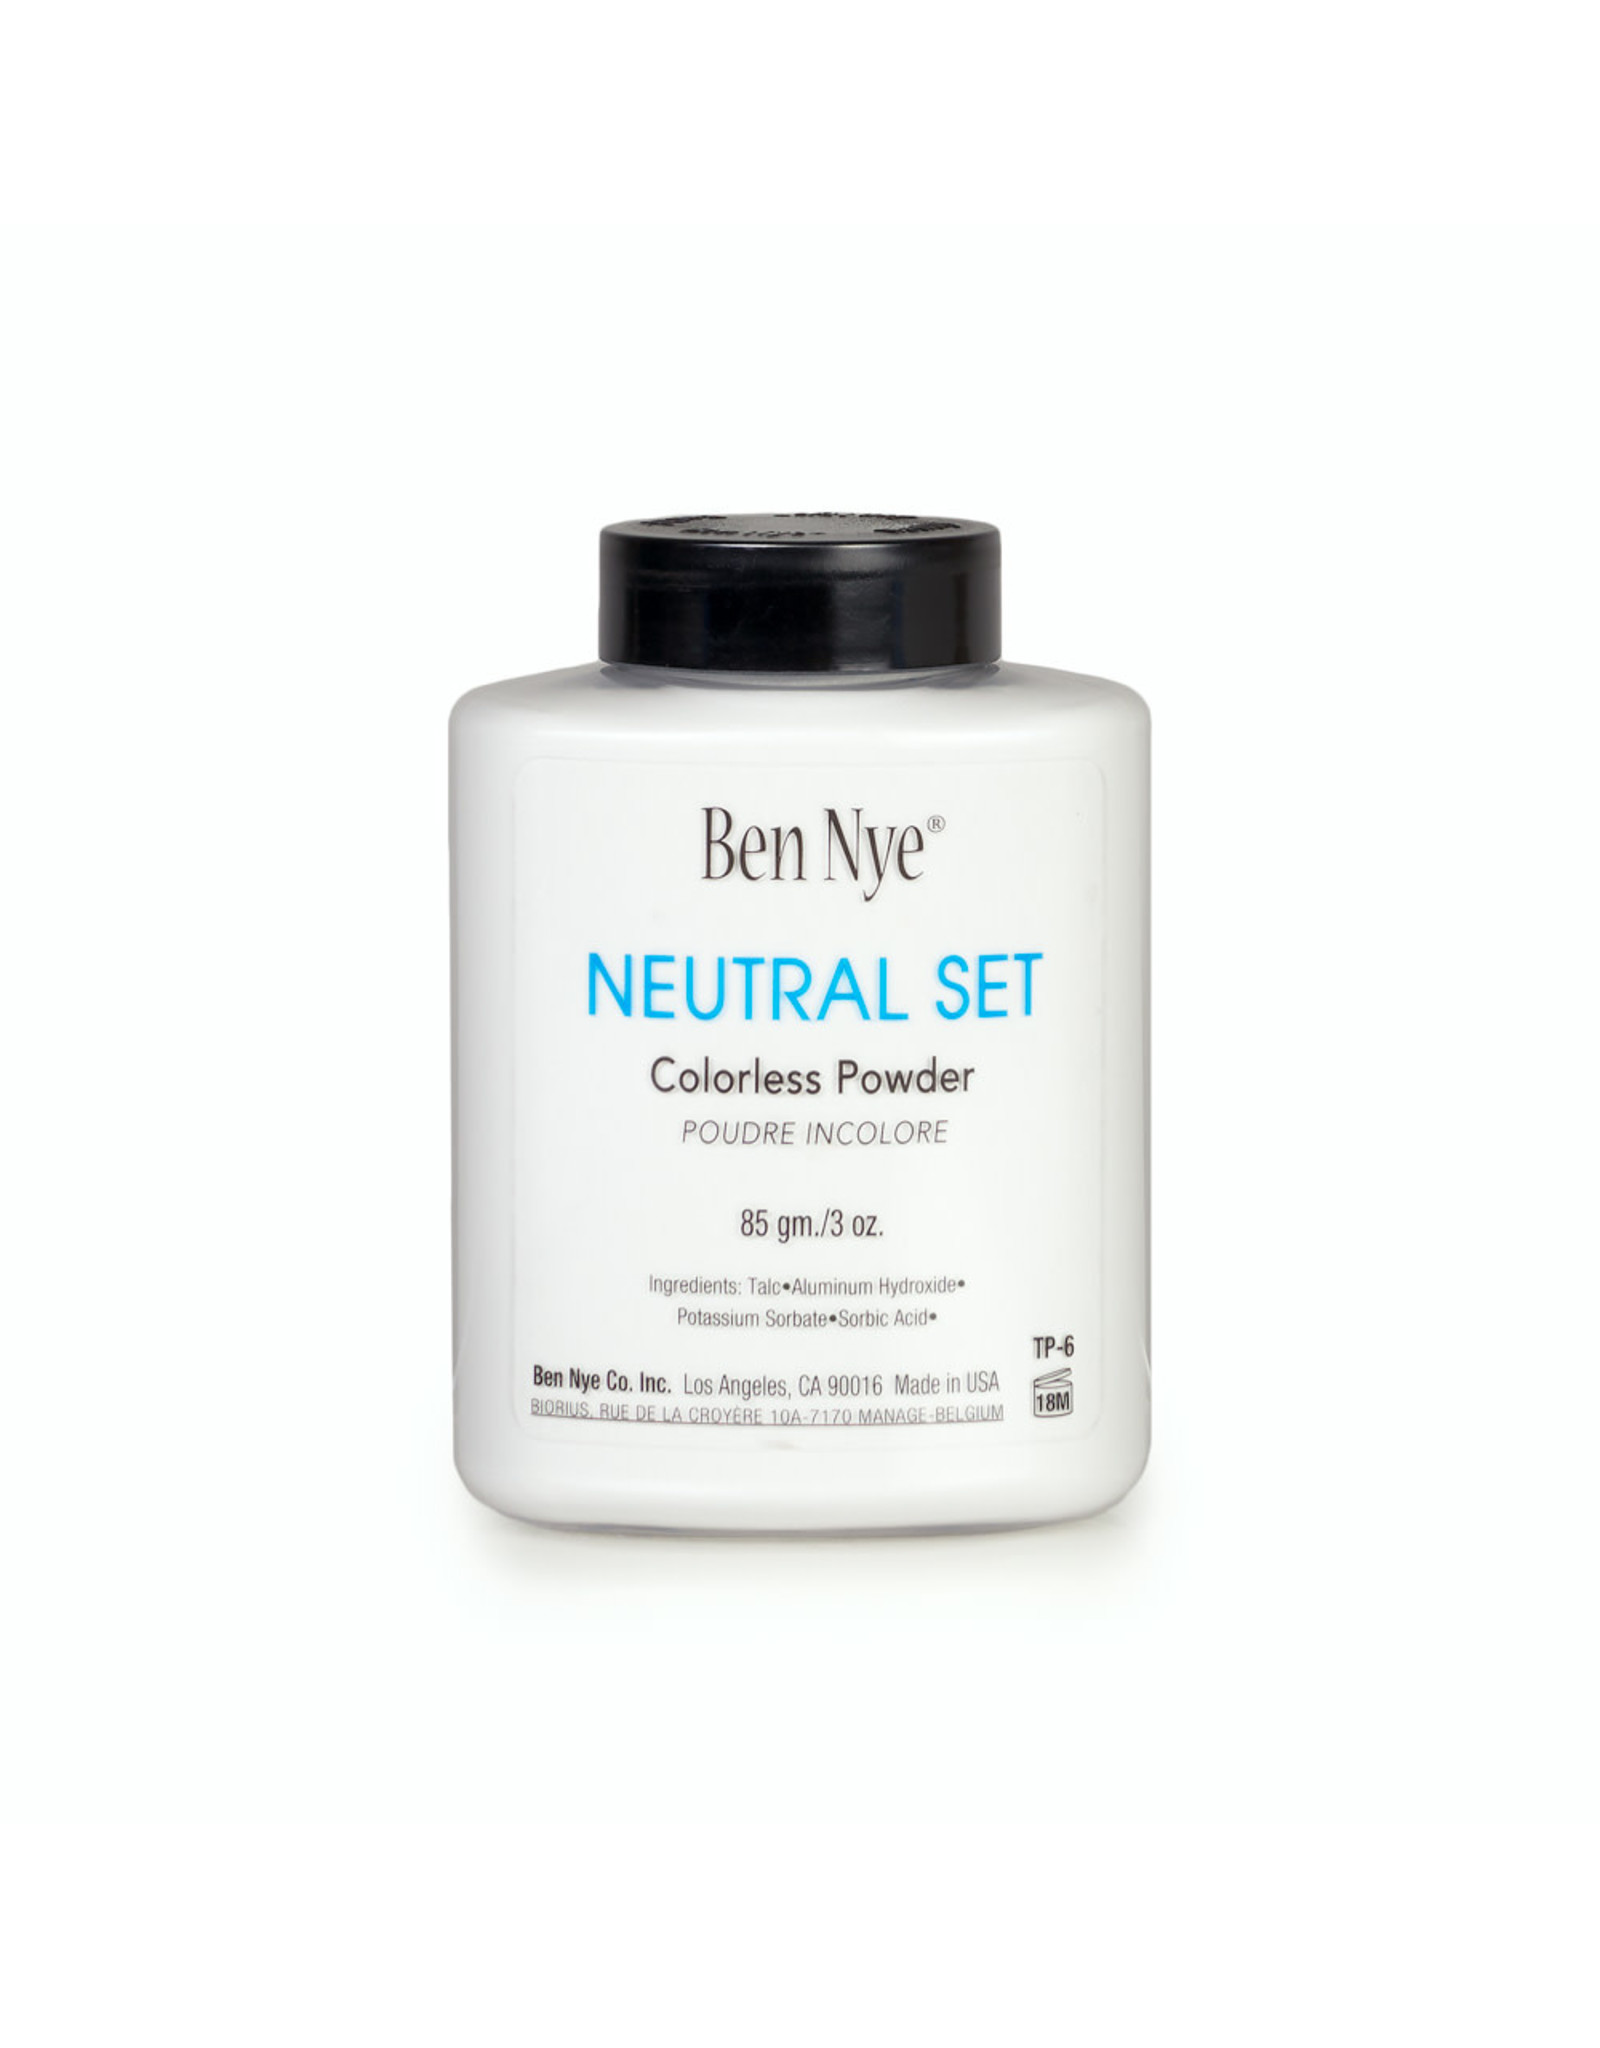 Ben Nye Ben Nye Neutral Set